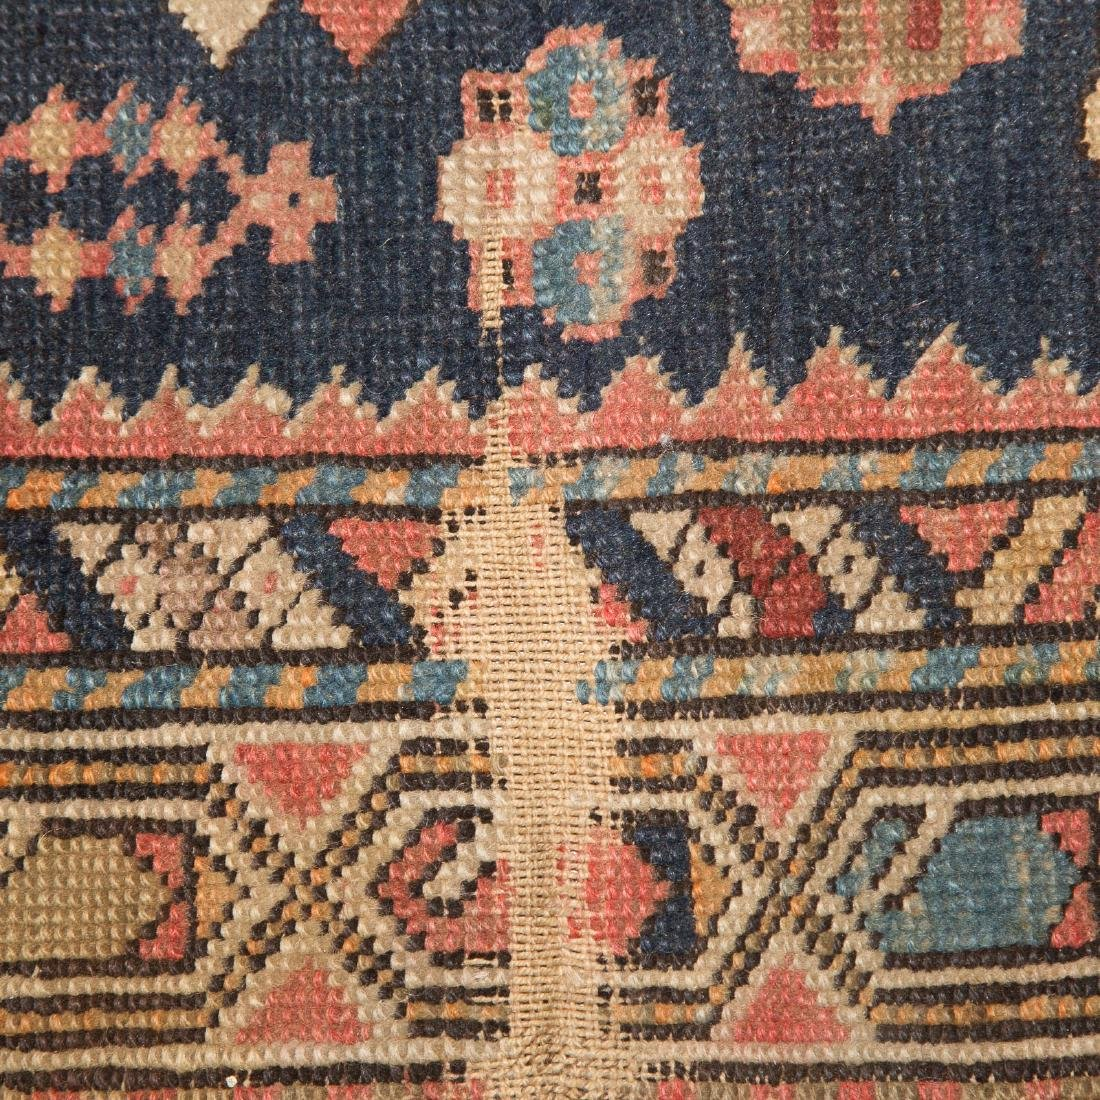 Antique Shirvan rug, approx. 3.5 x 5.3 - 4